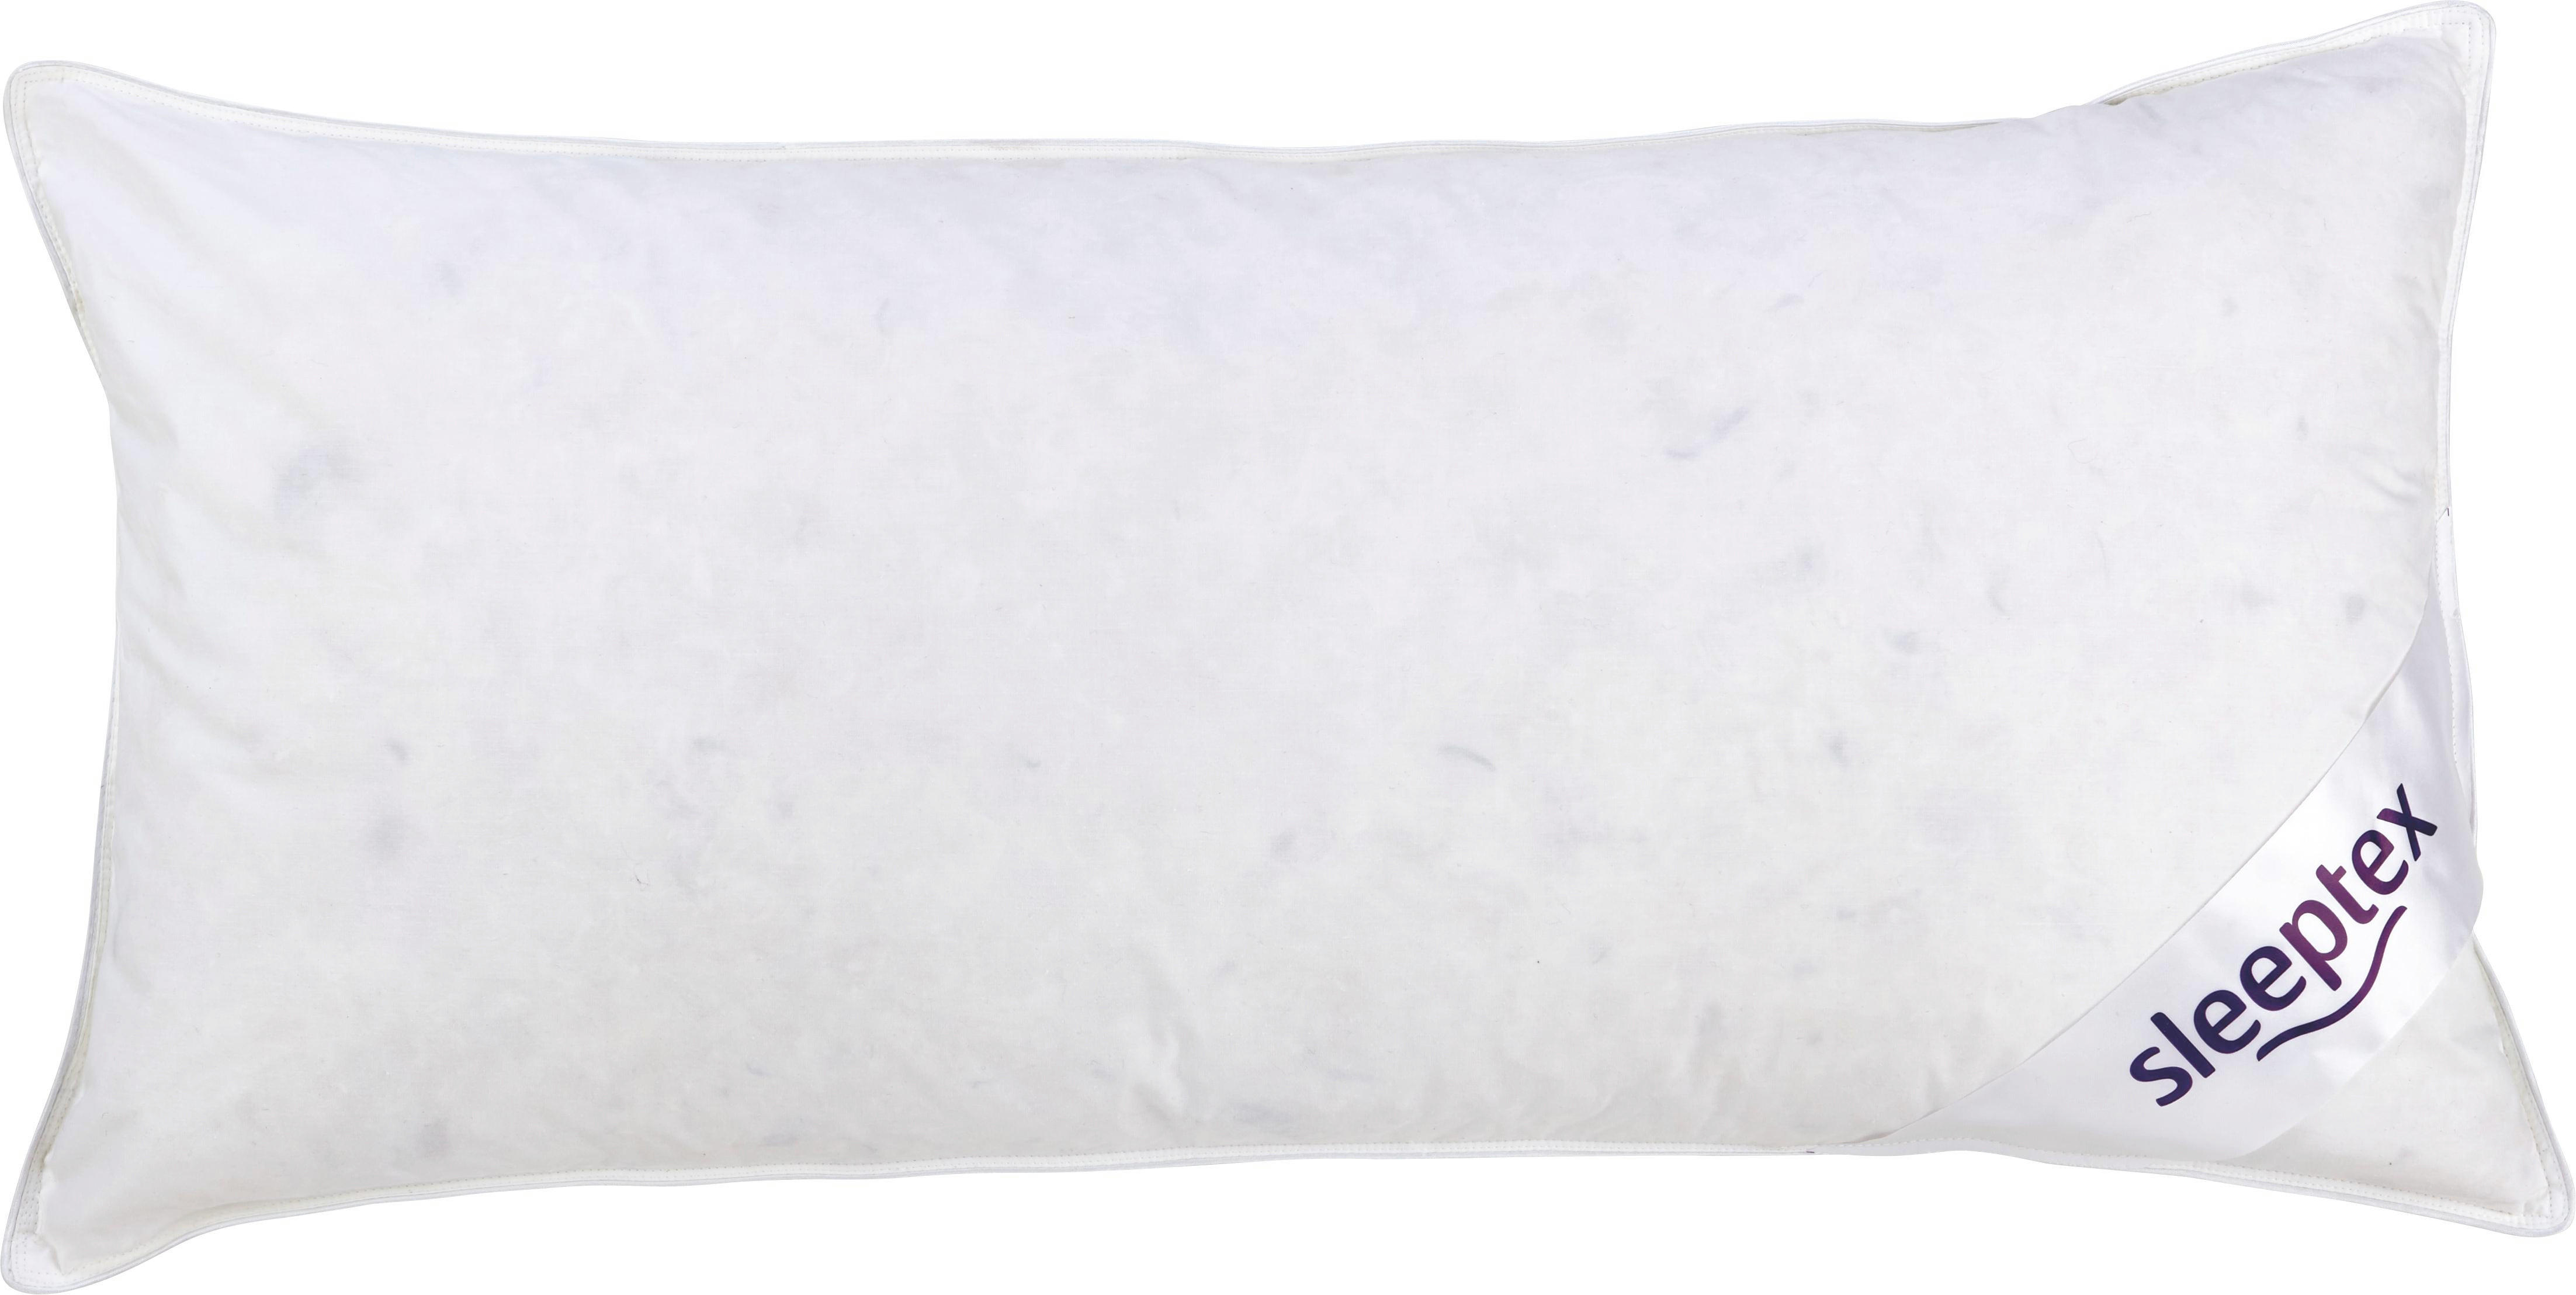 3-KAMMER-KISSEN  40/80 cm - Weiß, Basics, Textil (40/80cm) - SLEEPTEX